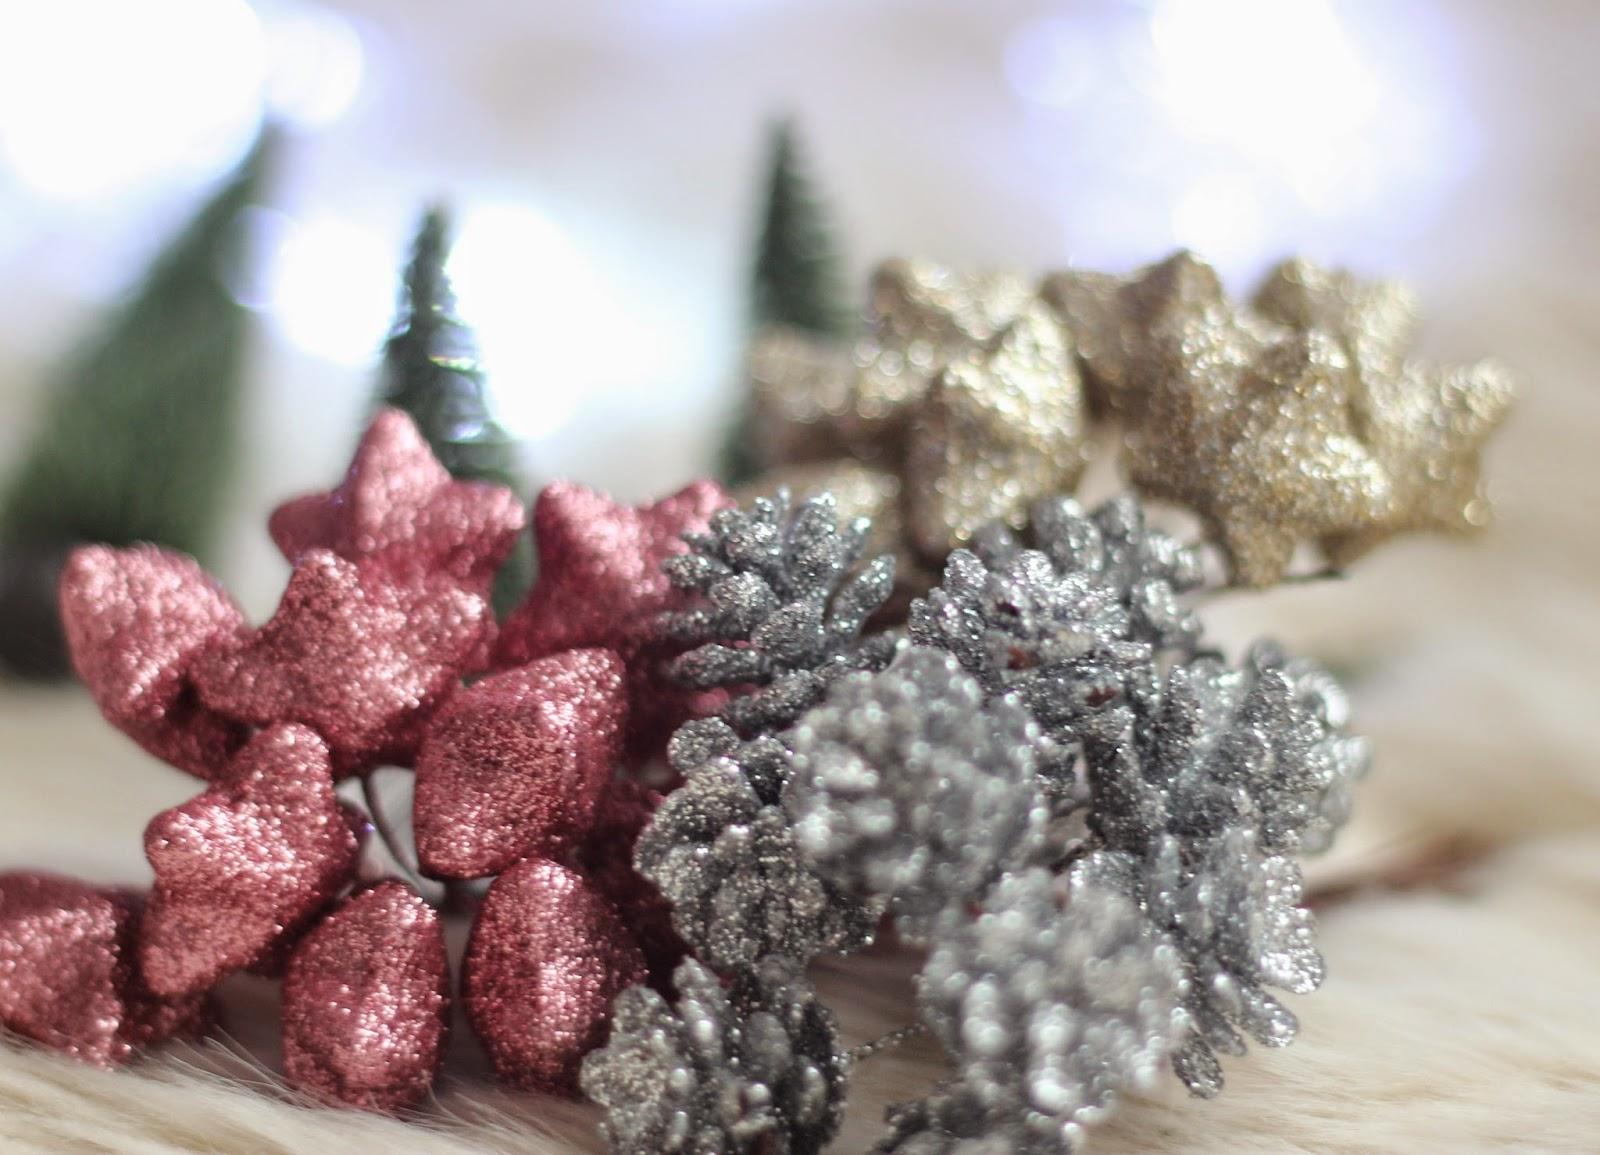 deco-navidad-adornos-arbol-piñas-estrellas-arbolitos-Sostrene-Grene